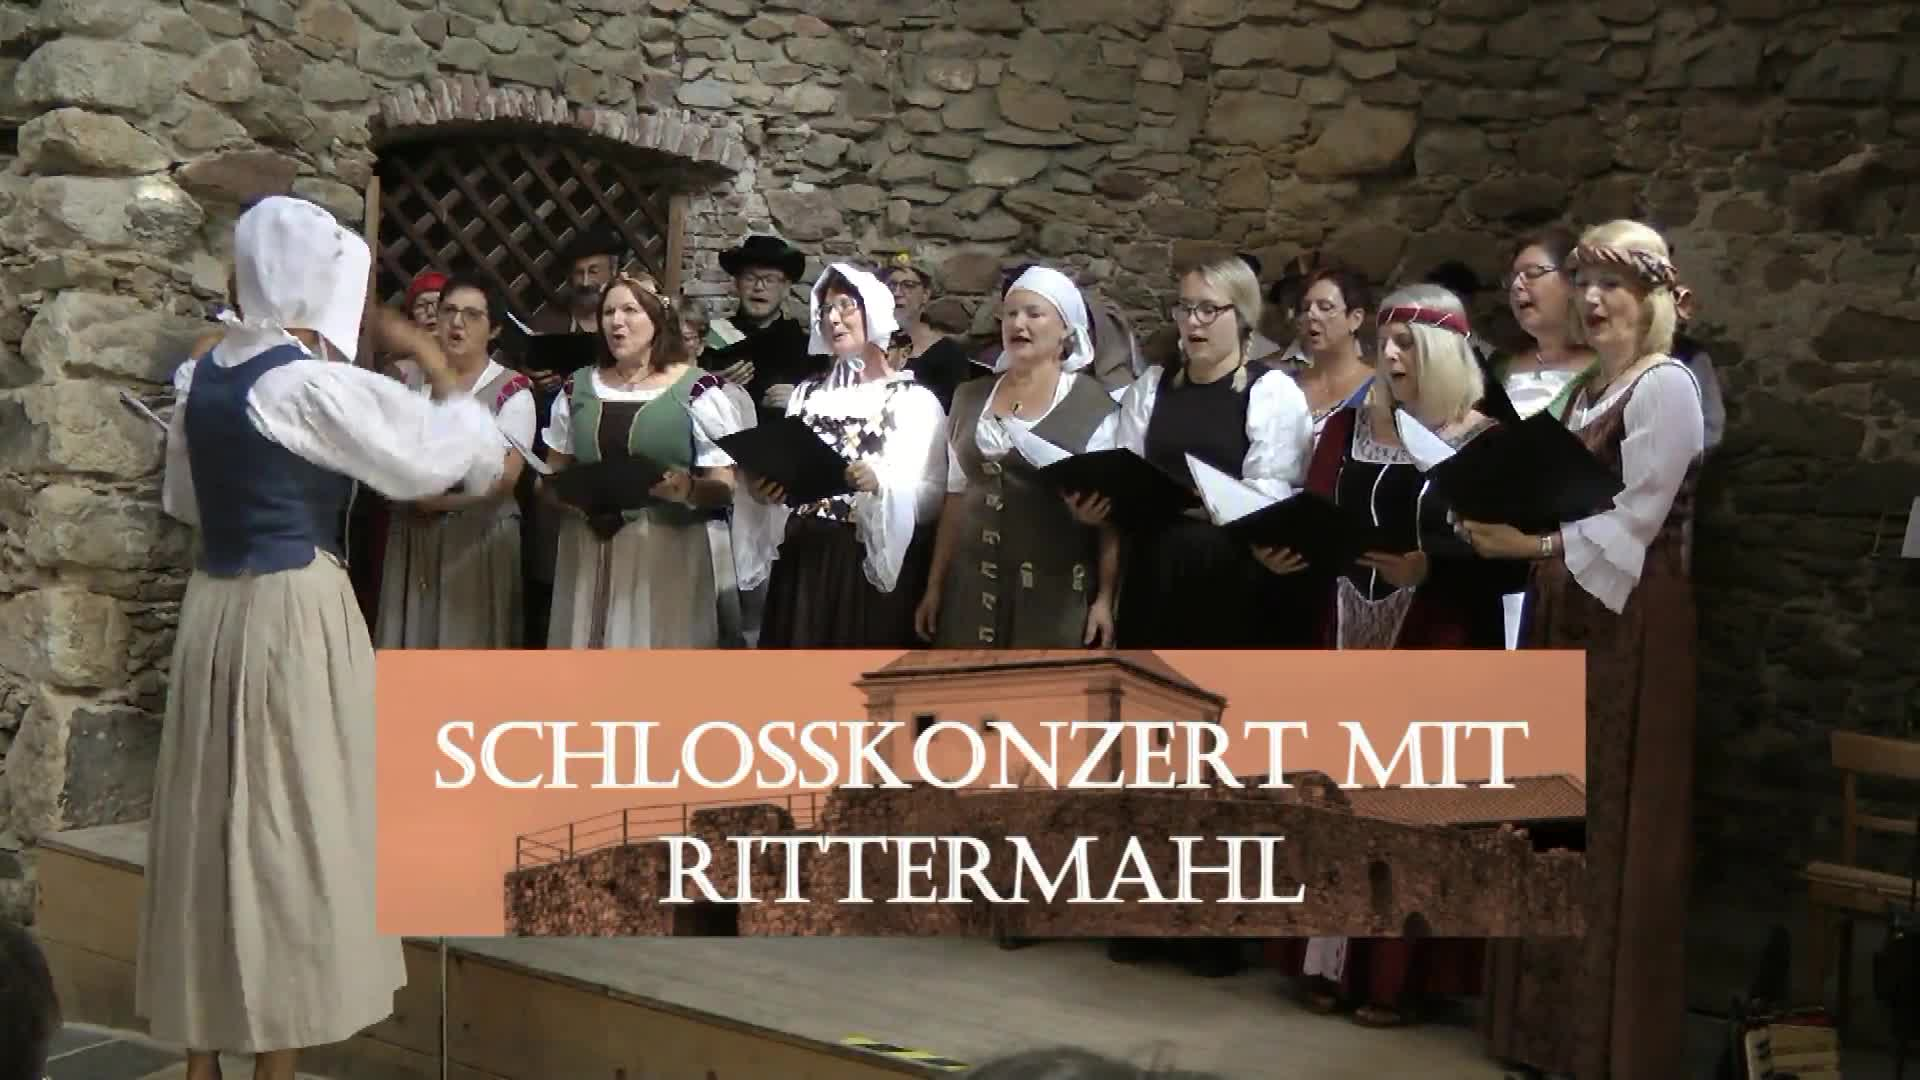 Schlosskonzert mit Rittermahl